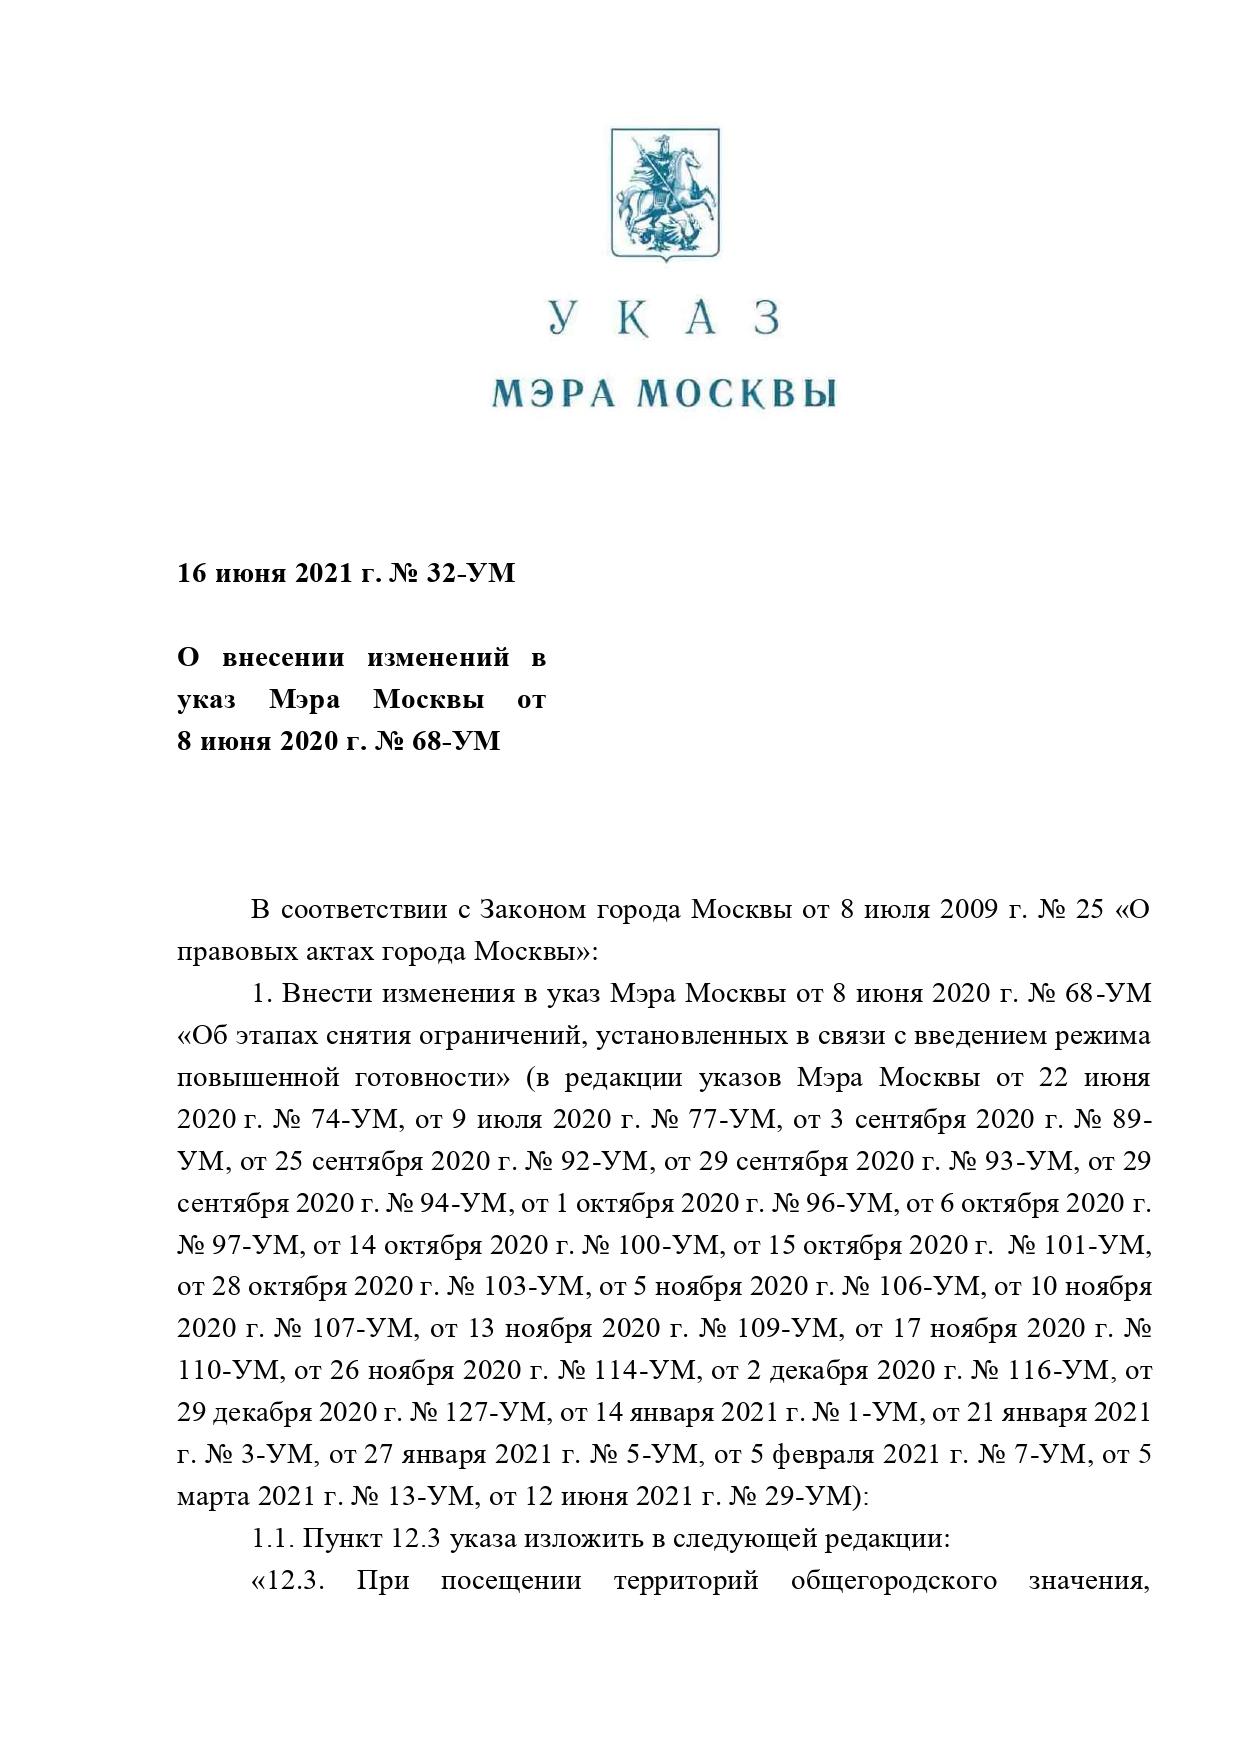 Указ Мэра Москвы N 32-УМ от 16.06.2021 об обязательной вакцинации от коронавируса - 1